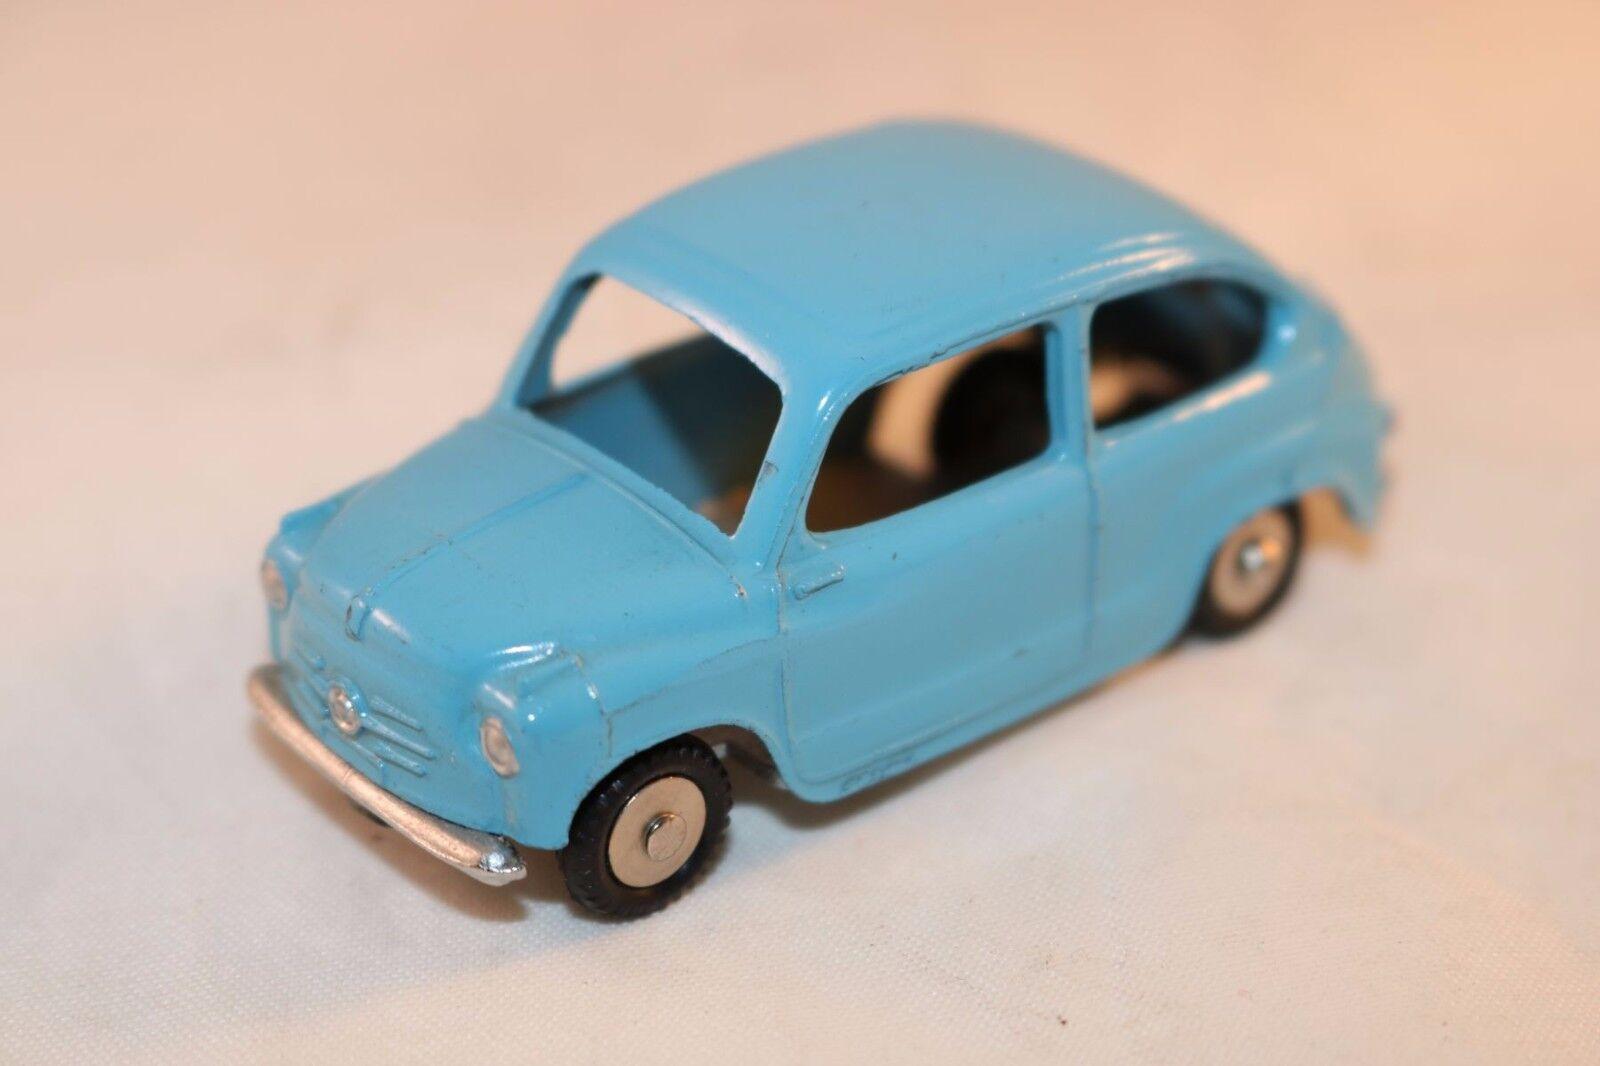 Mercury 18 Fiat - 600 blue in mint complete original conditon RARO scarce